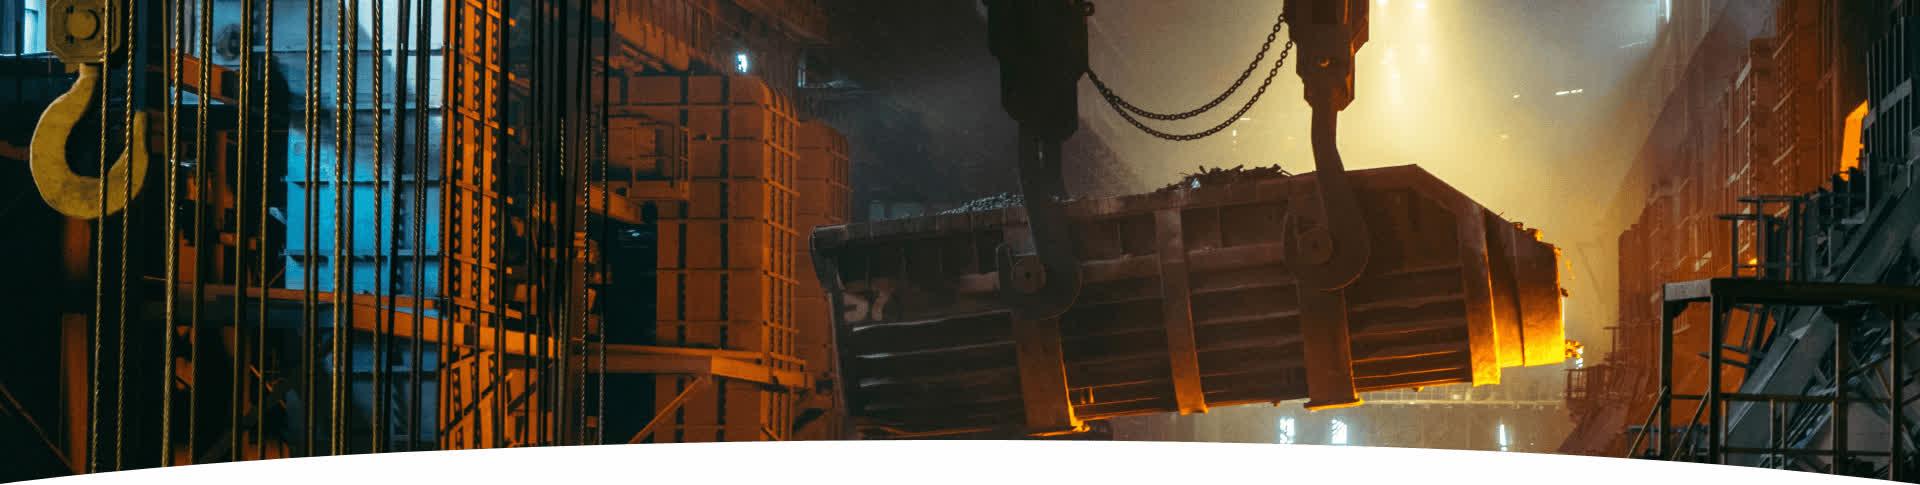 sl-industriel